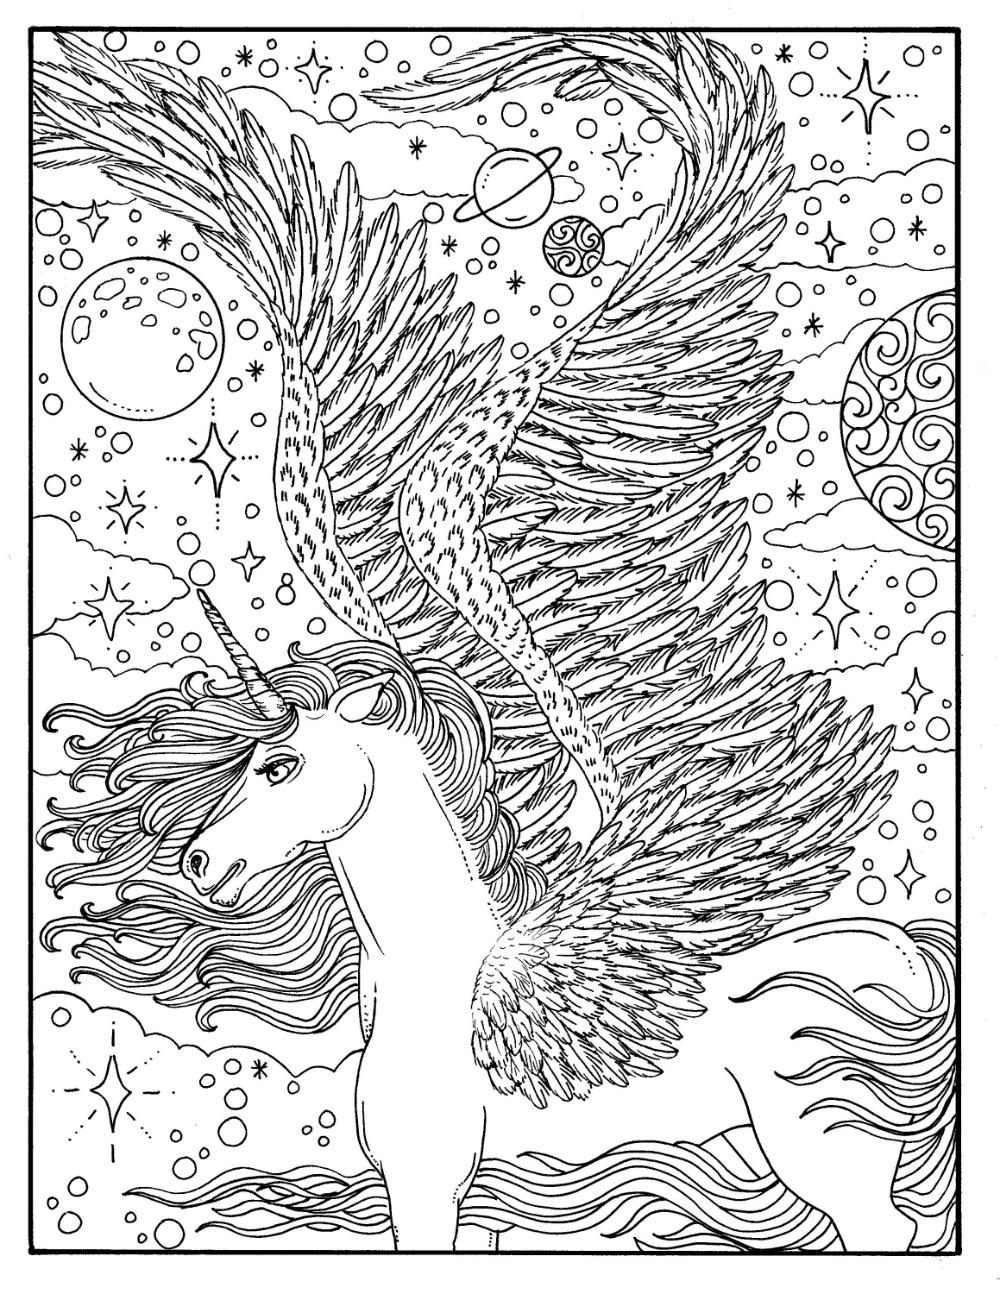 Digital Coloring Book Unicorn Dreams Magical Fantasy ...